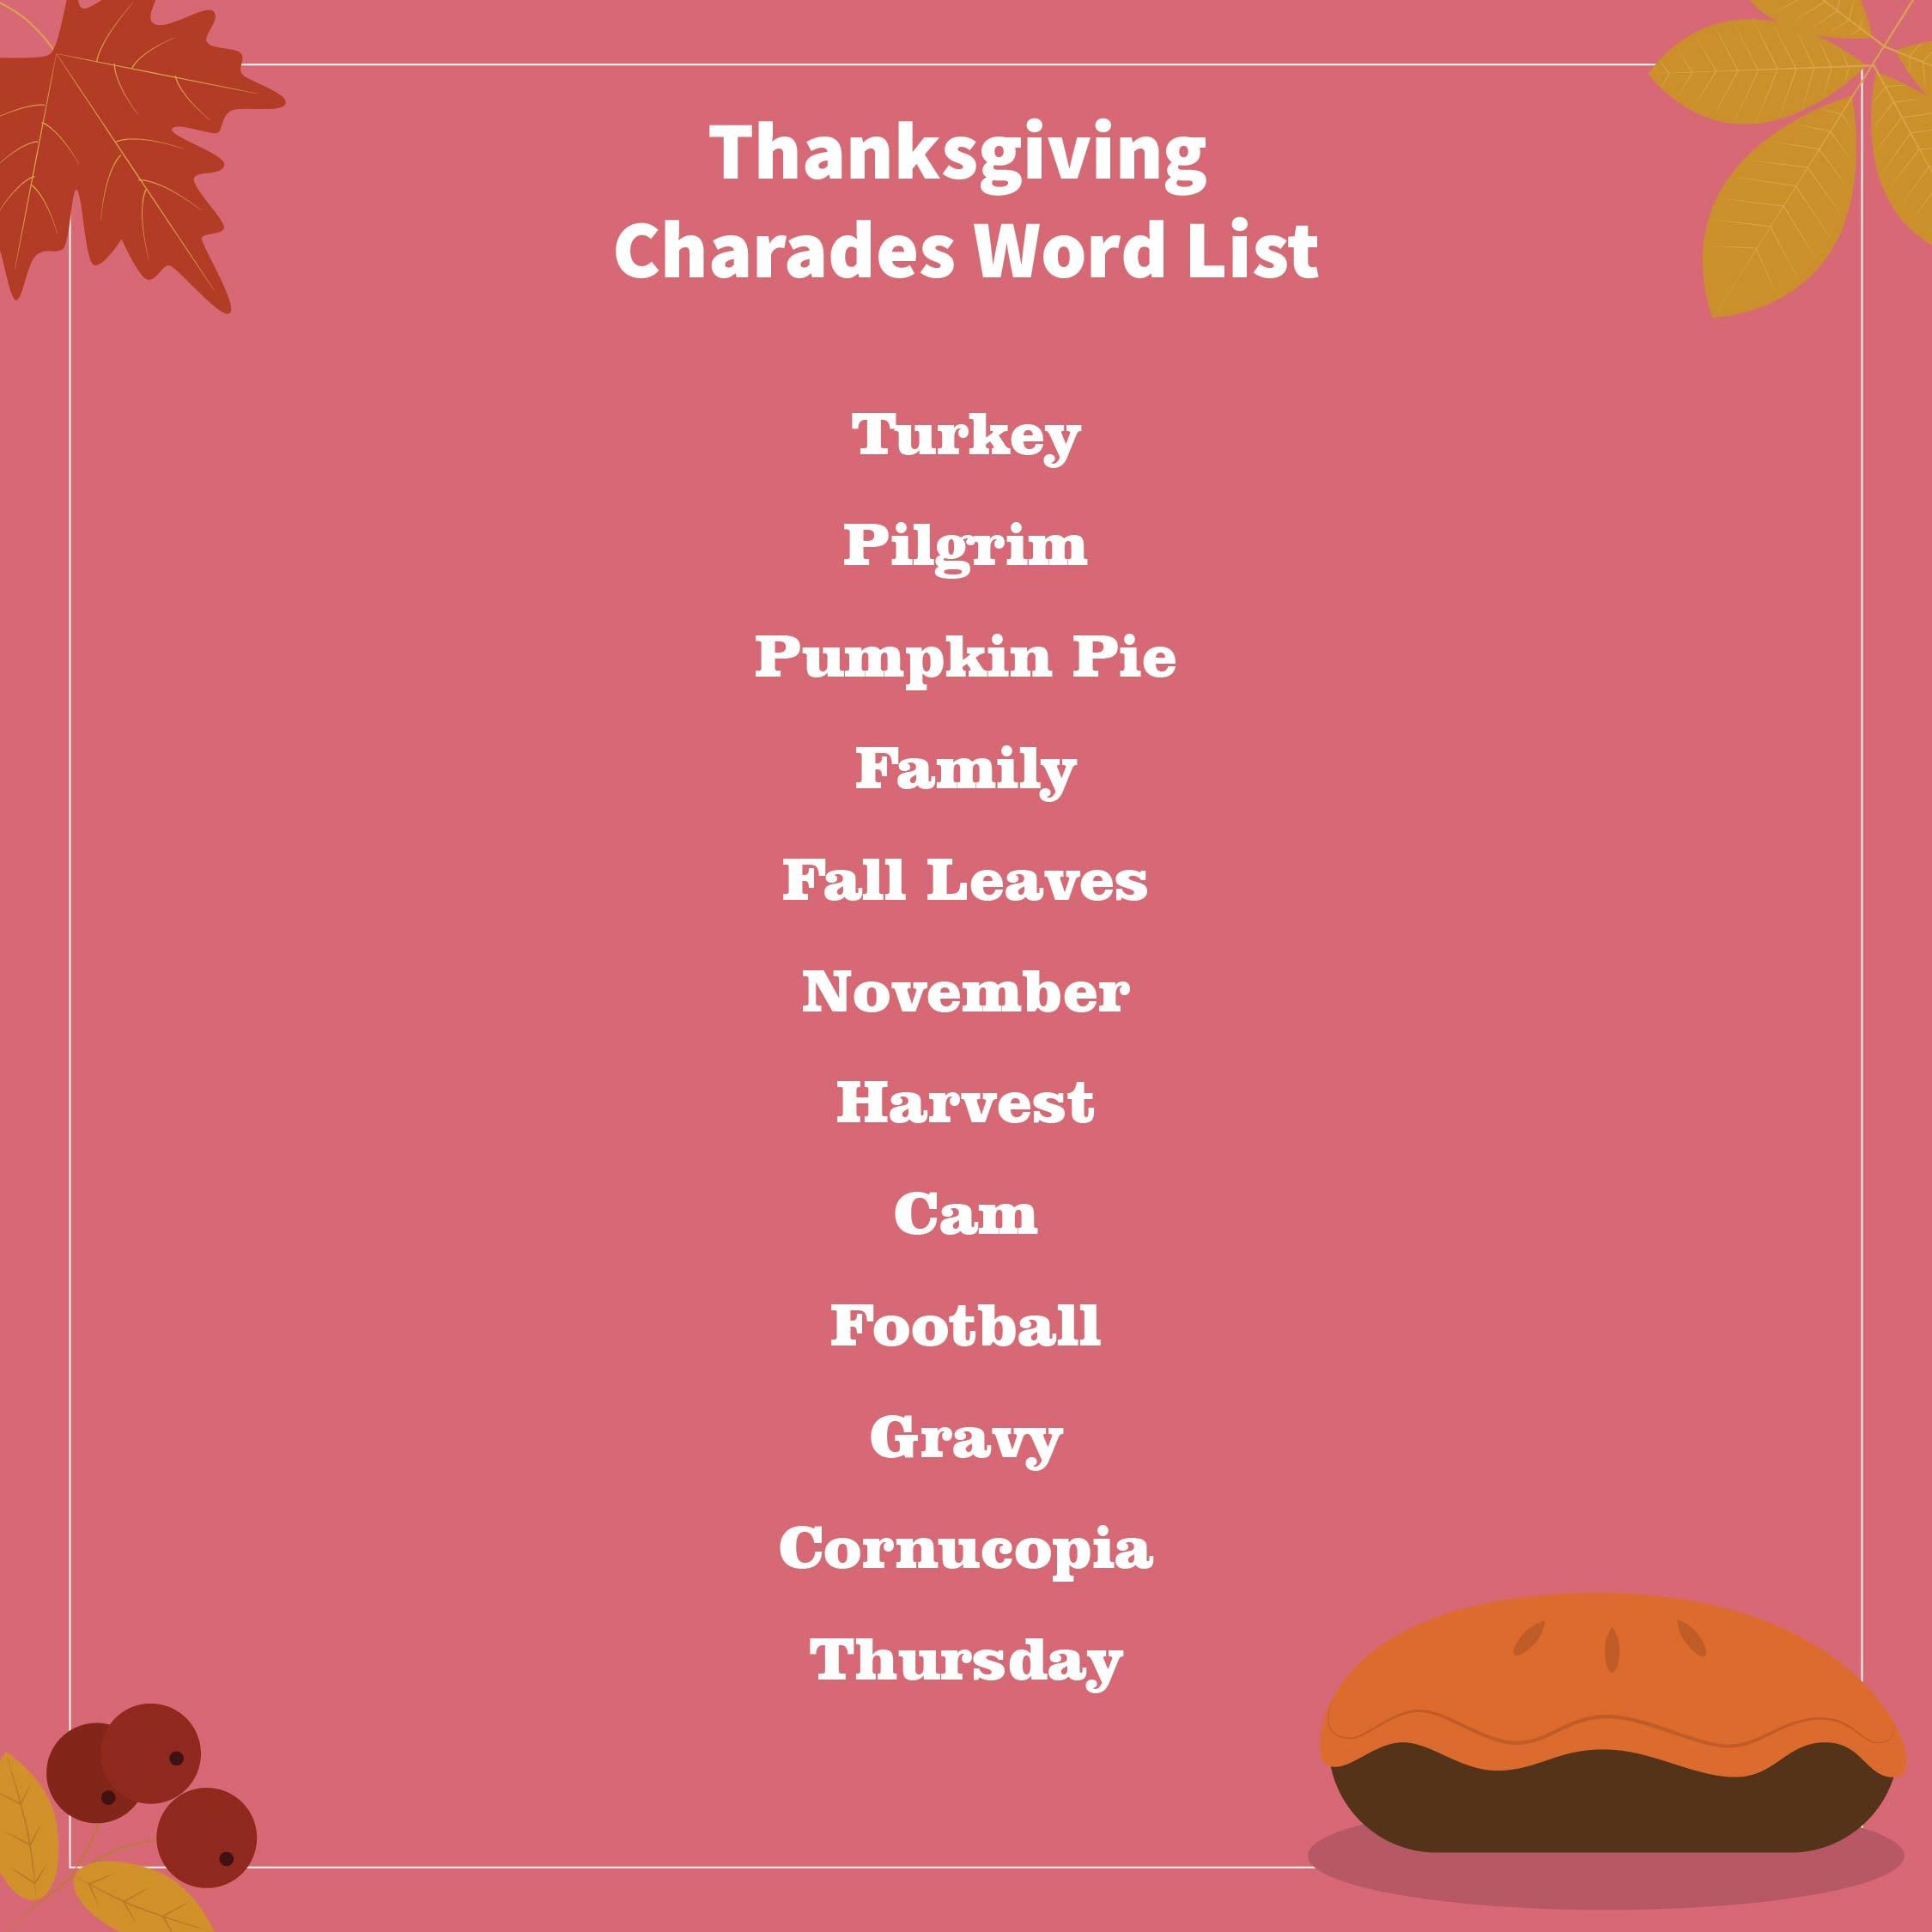 Thanksgiving Charades Word List